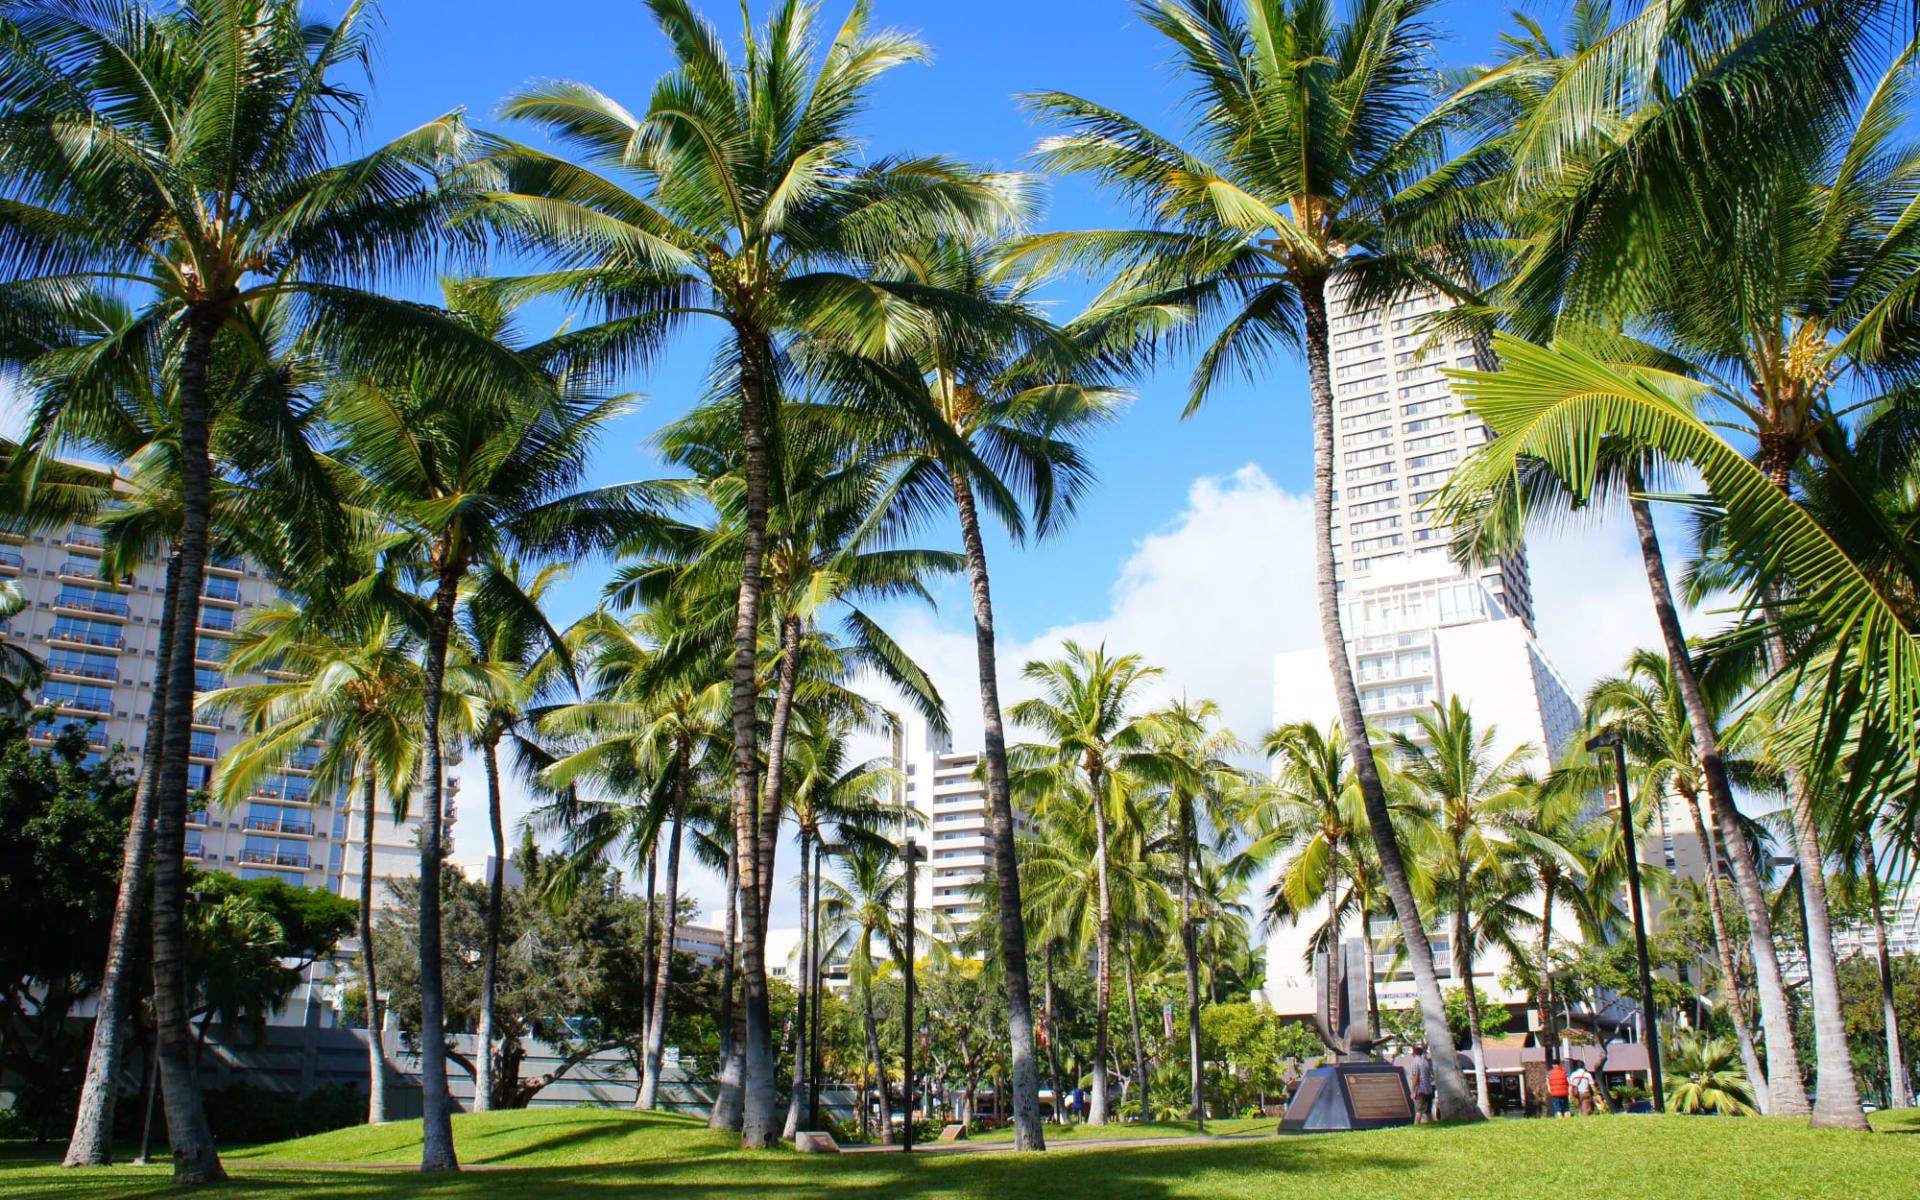 Aqua Bamboo Hotel in Honolulu - Oahu: shutterstock_575340022_oahu